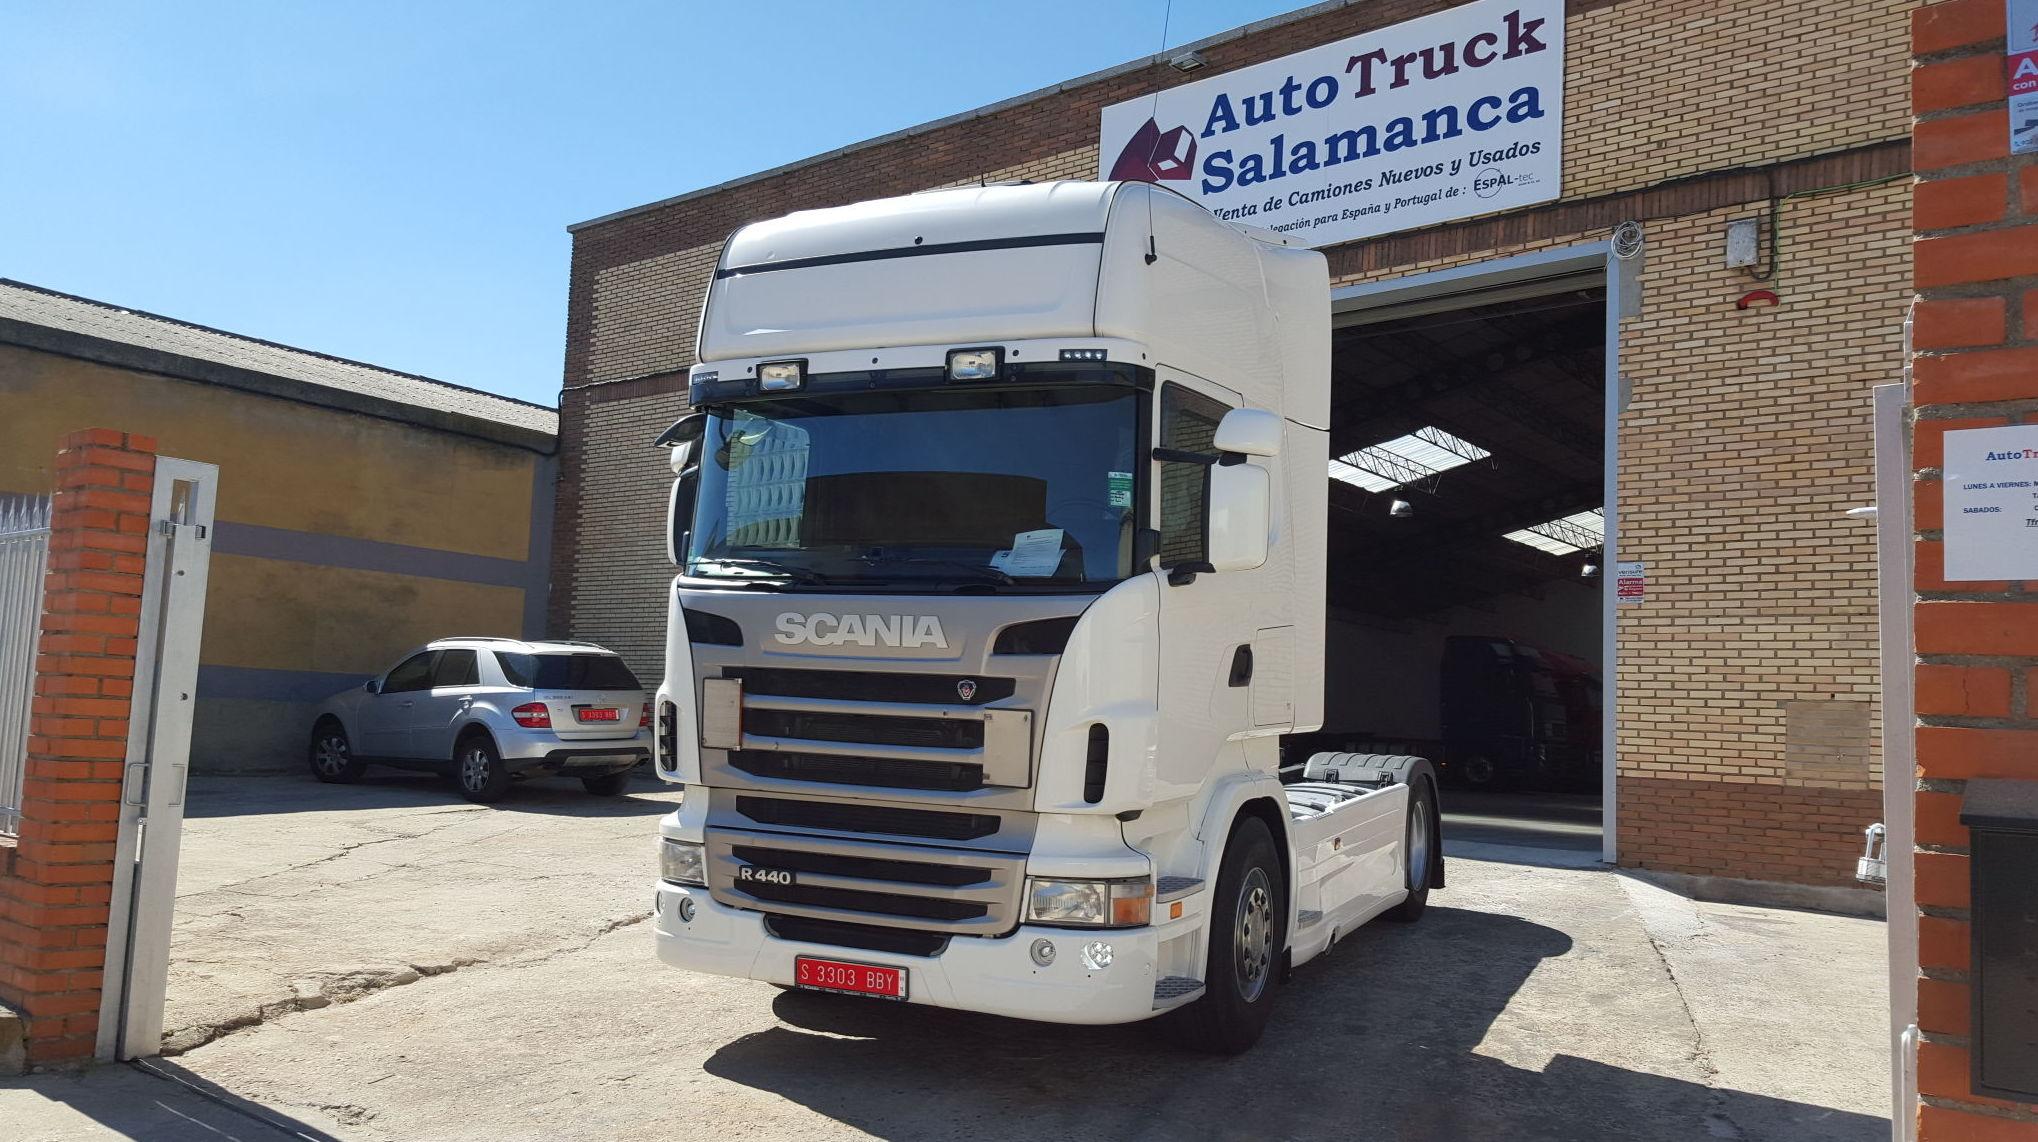 Foto 11 de Camiones en Villares de la Reina | Autotruck Salamanca